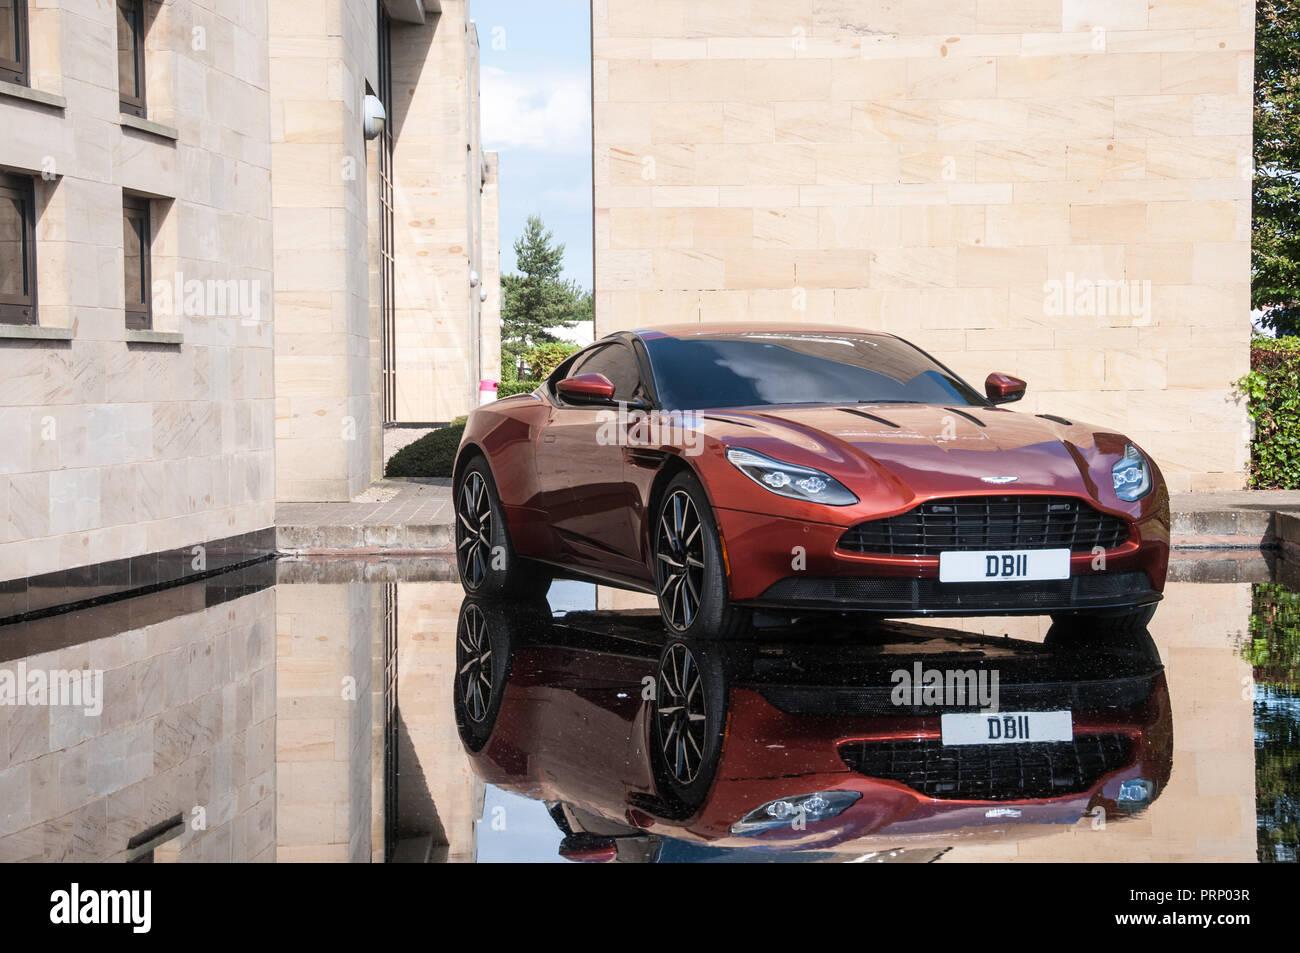 Aston Martin - Stock Image